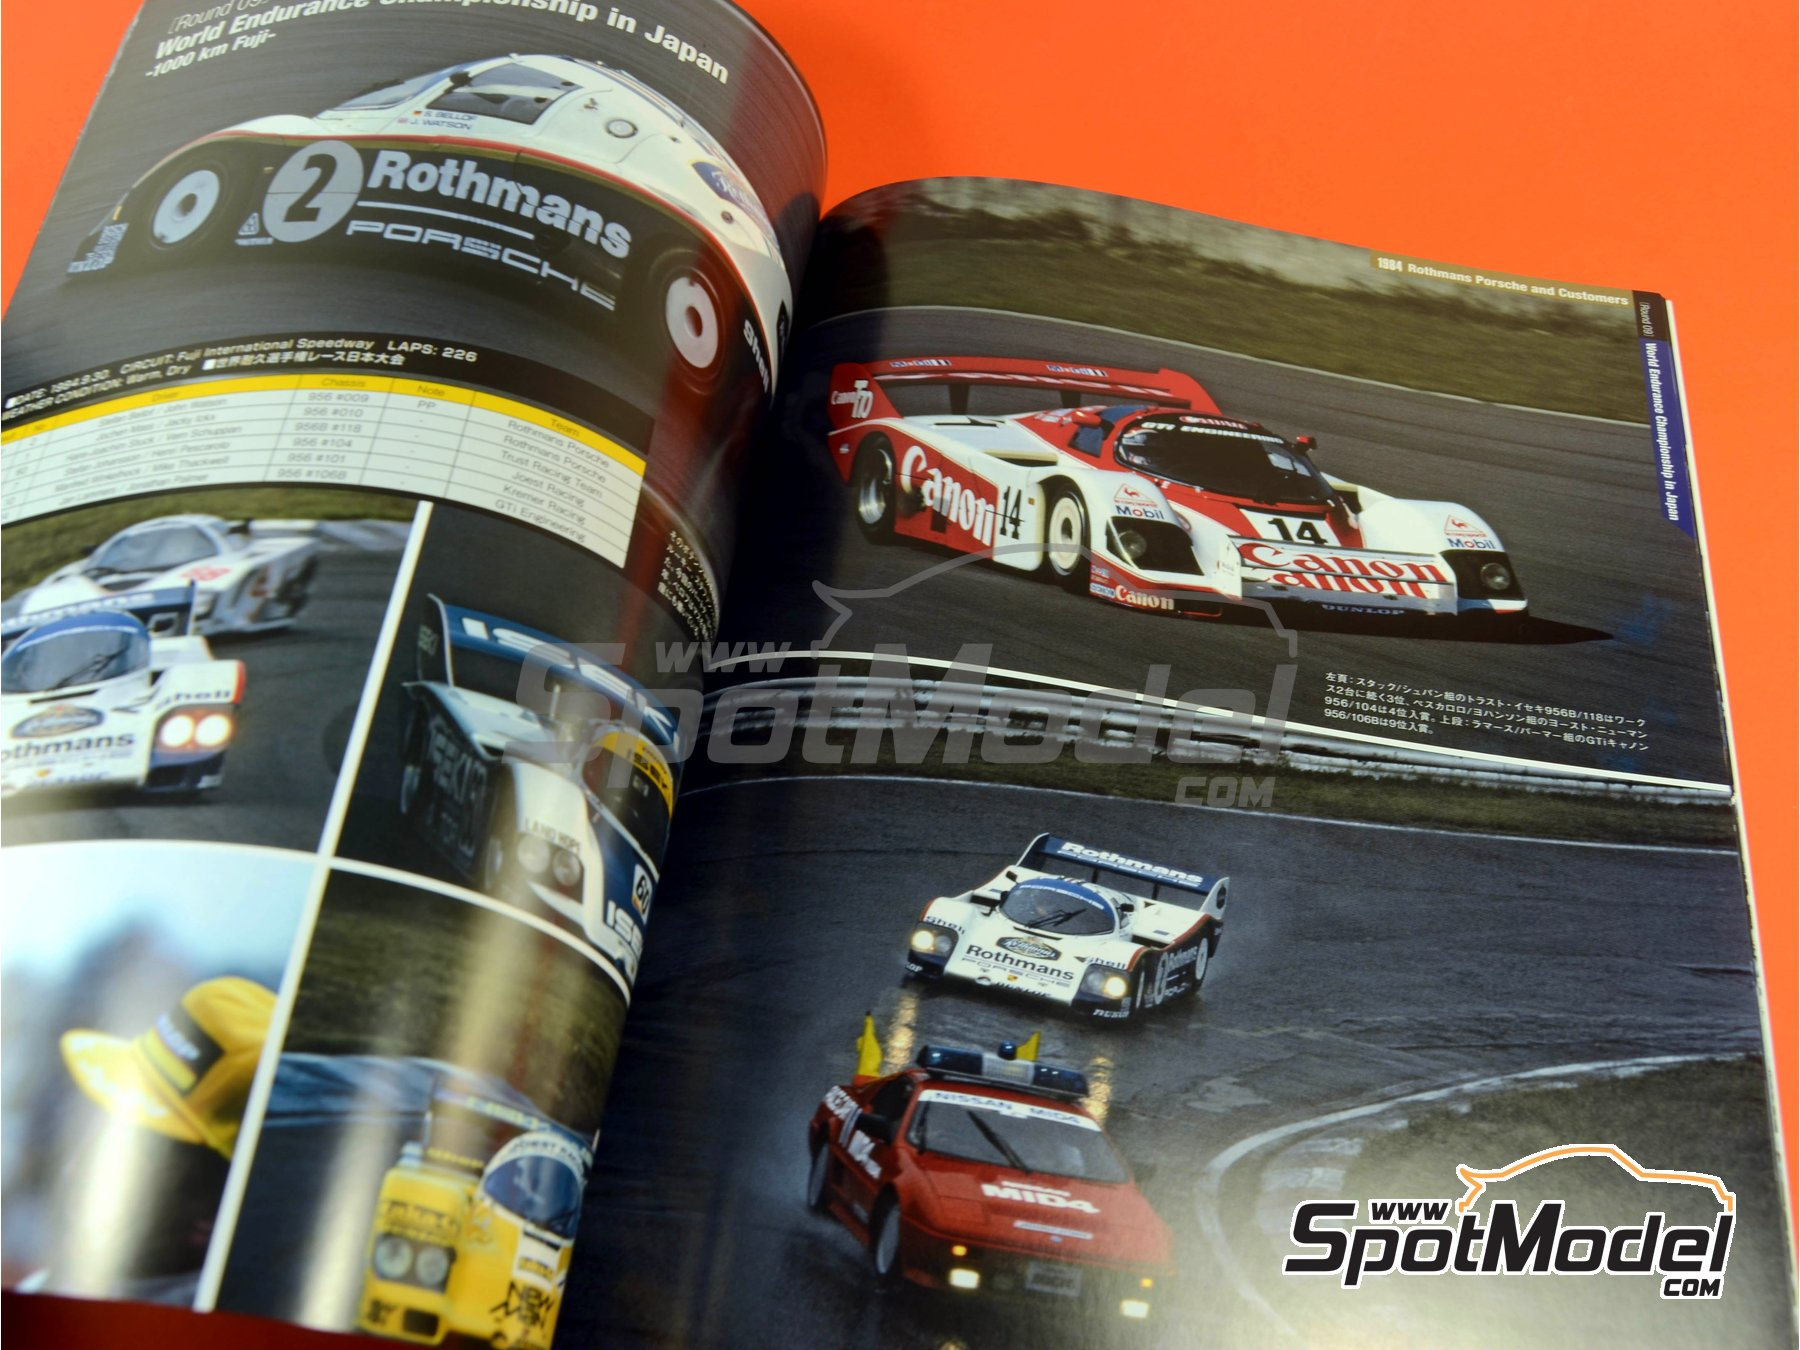 Image 8: Joe Honda Sportscar Spectacles - Porsche 956 - 24 Horas de Le Mans, 1000 Kilómetros de Suzuka, 6 Horas de Silverstone, 6 Horas de Fuji 1982, 1983, 1984, 1985 y 1985 | Libro de referencia fabricado por Model Factory Hiro (ref.MFH-SS007)